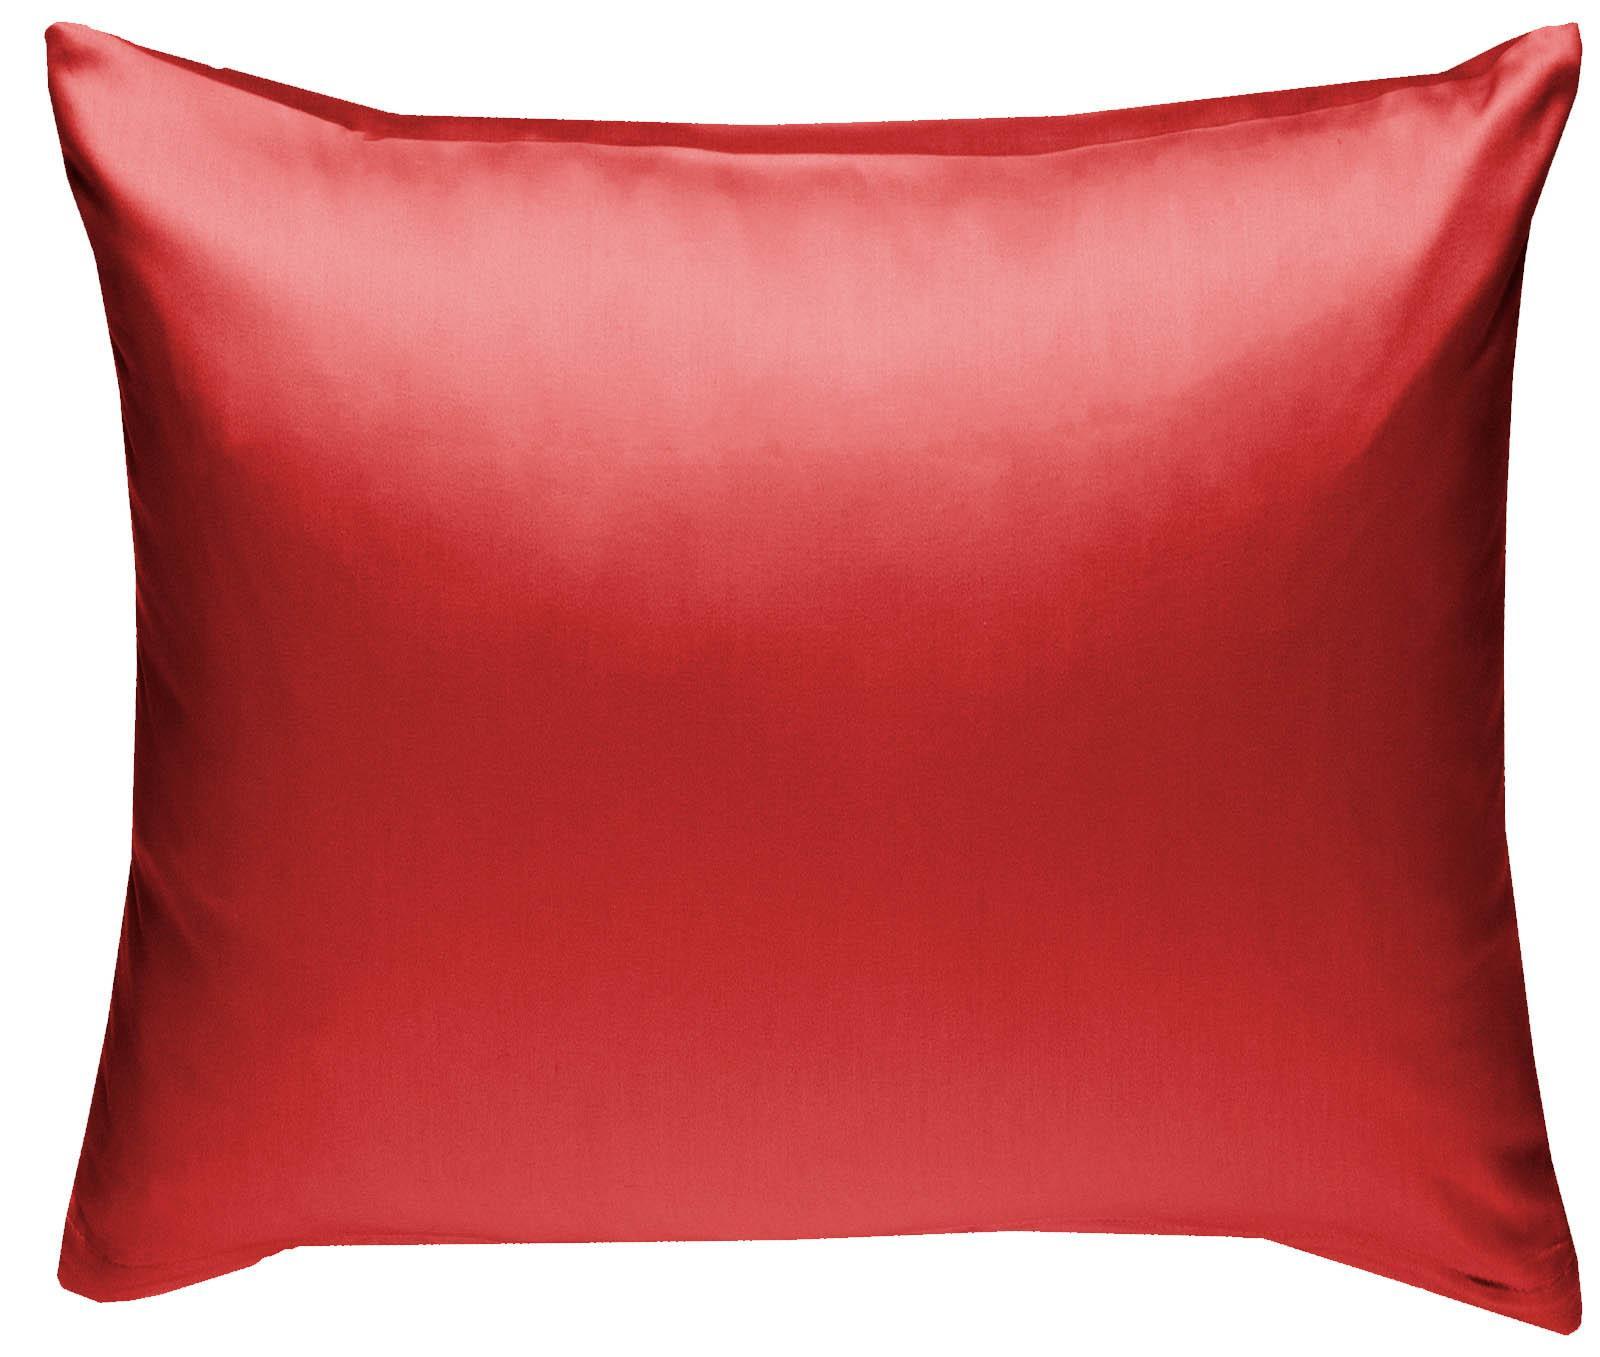 Mako Satin Kissenbezug uni rot 80x80 cm